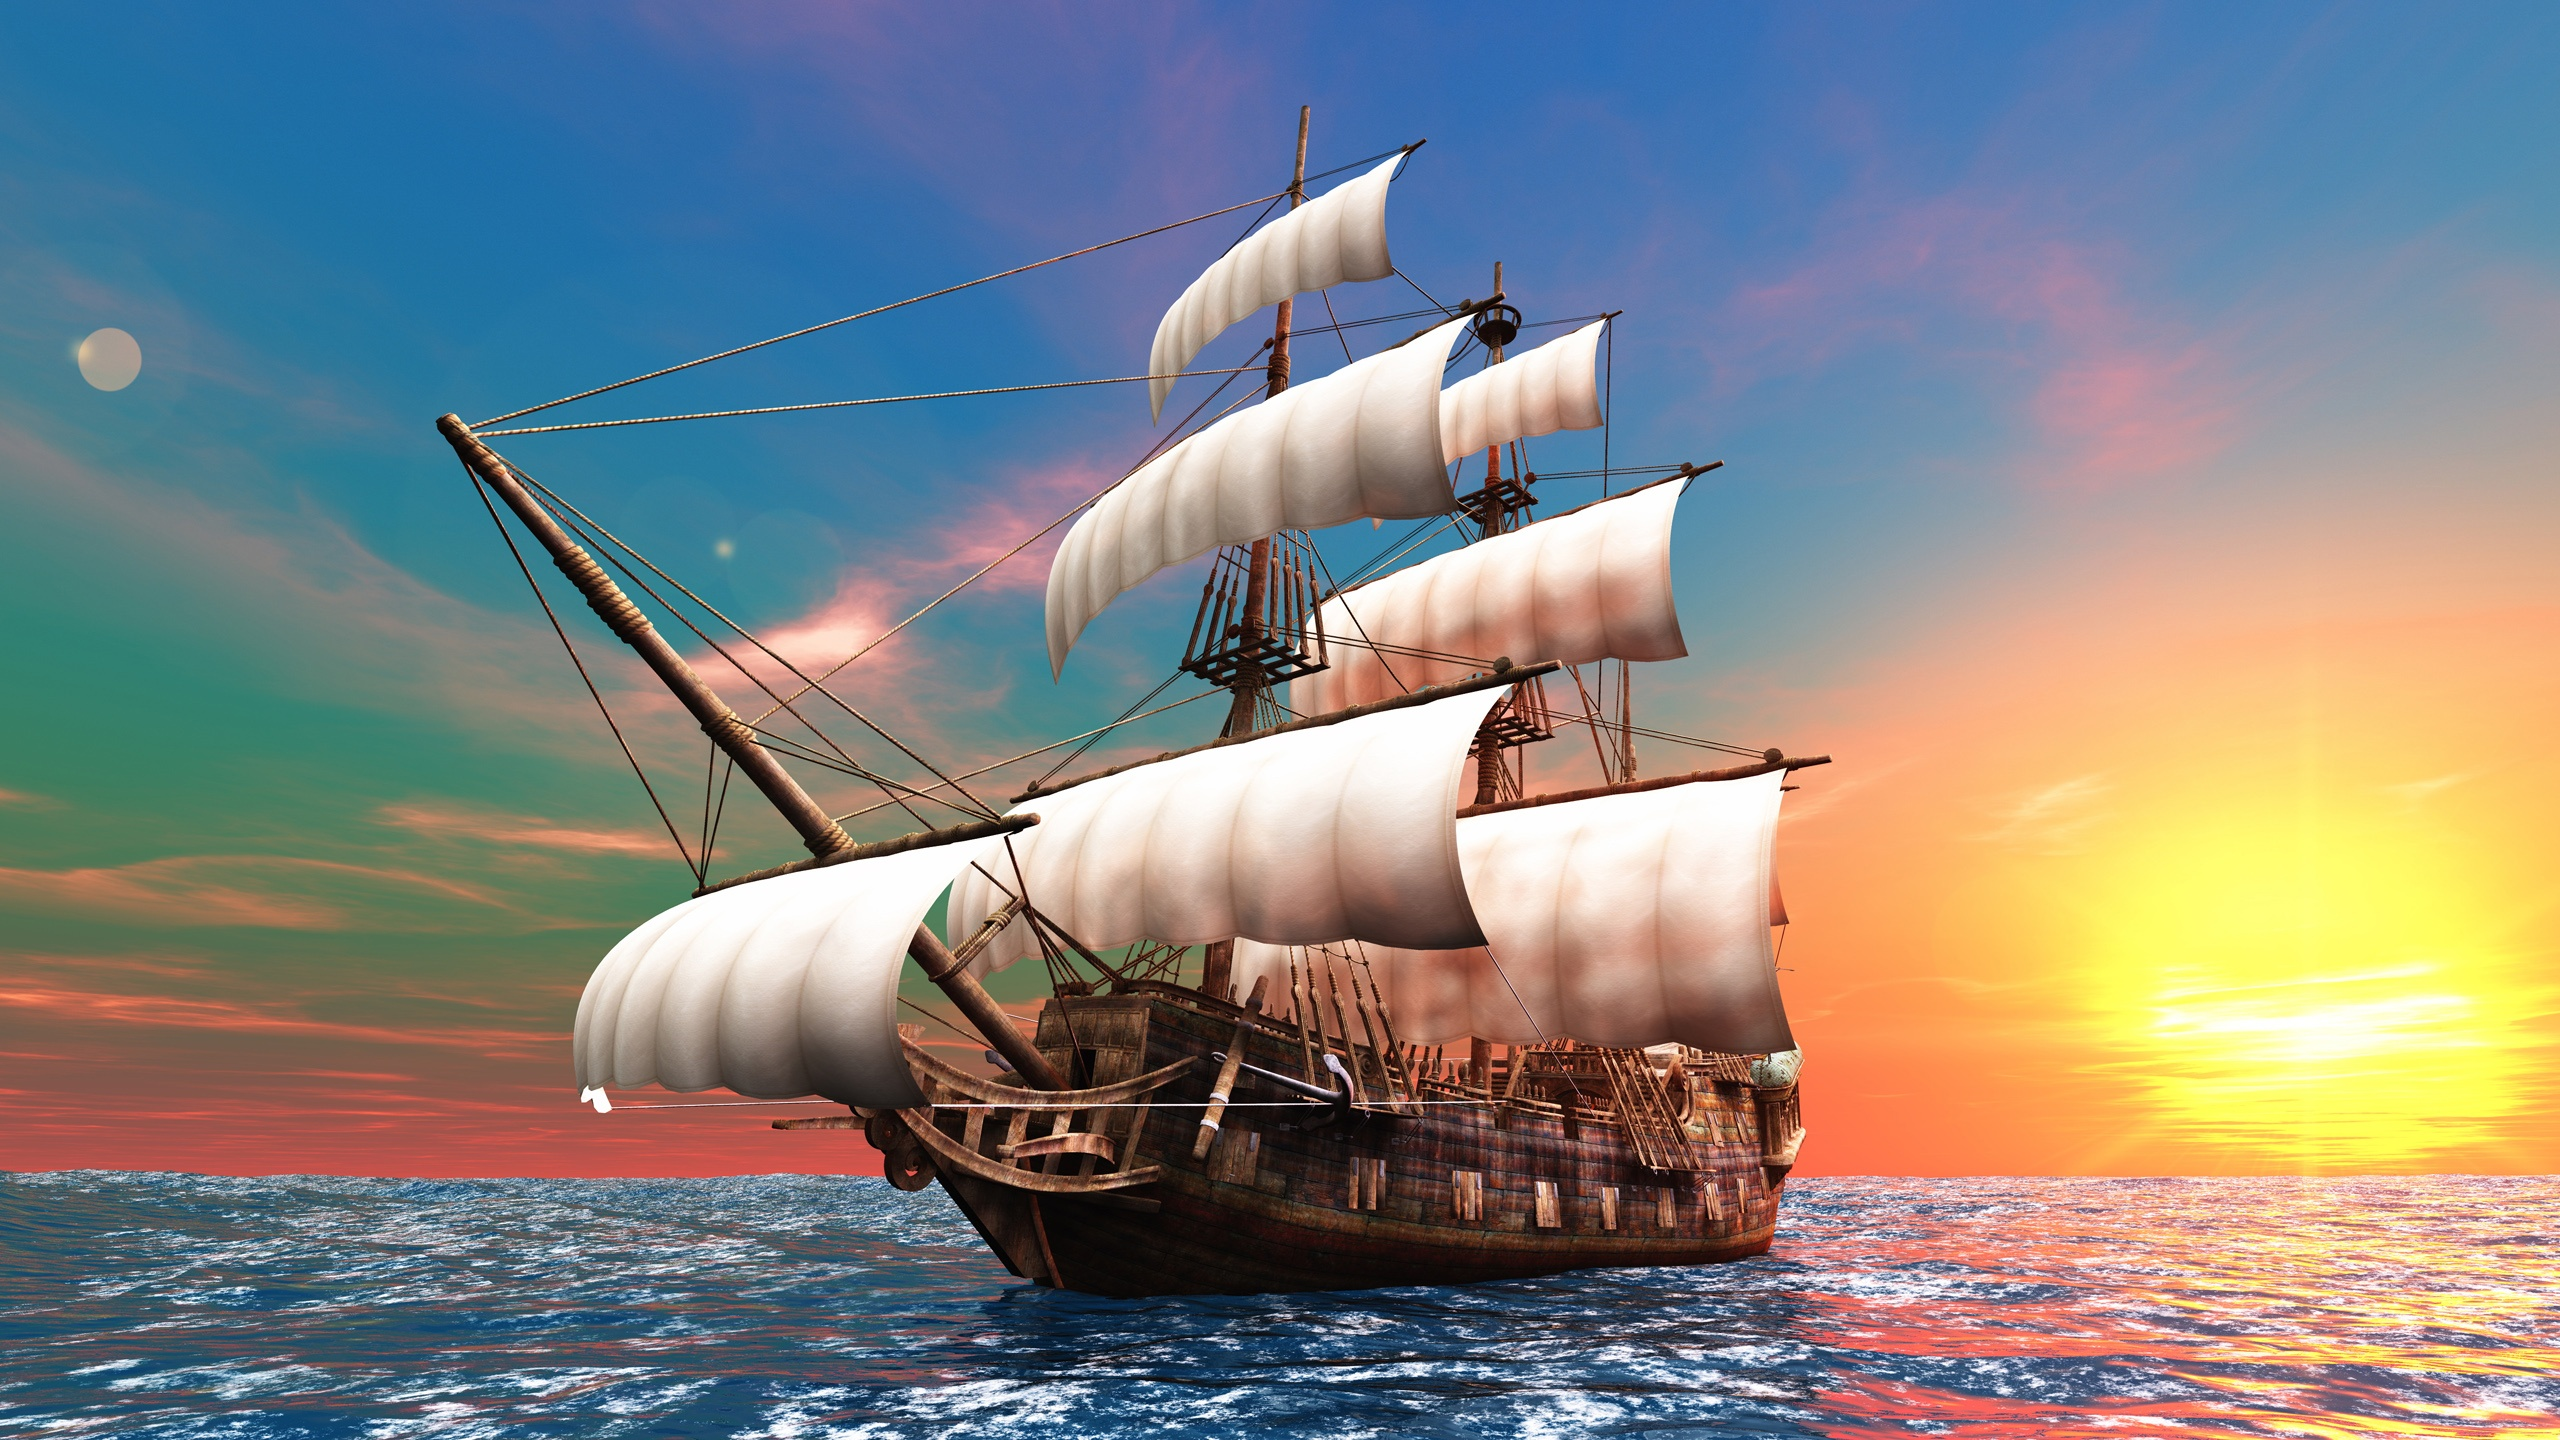 3d创意设计图片,帆船,黎明,海图片